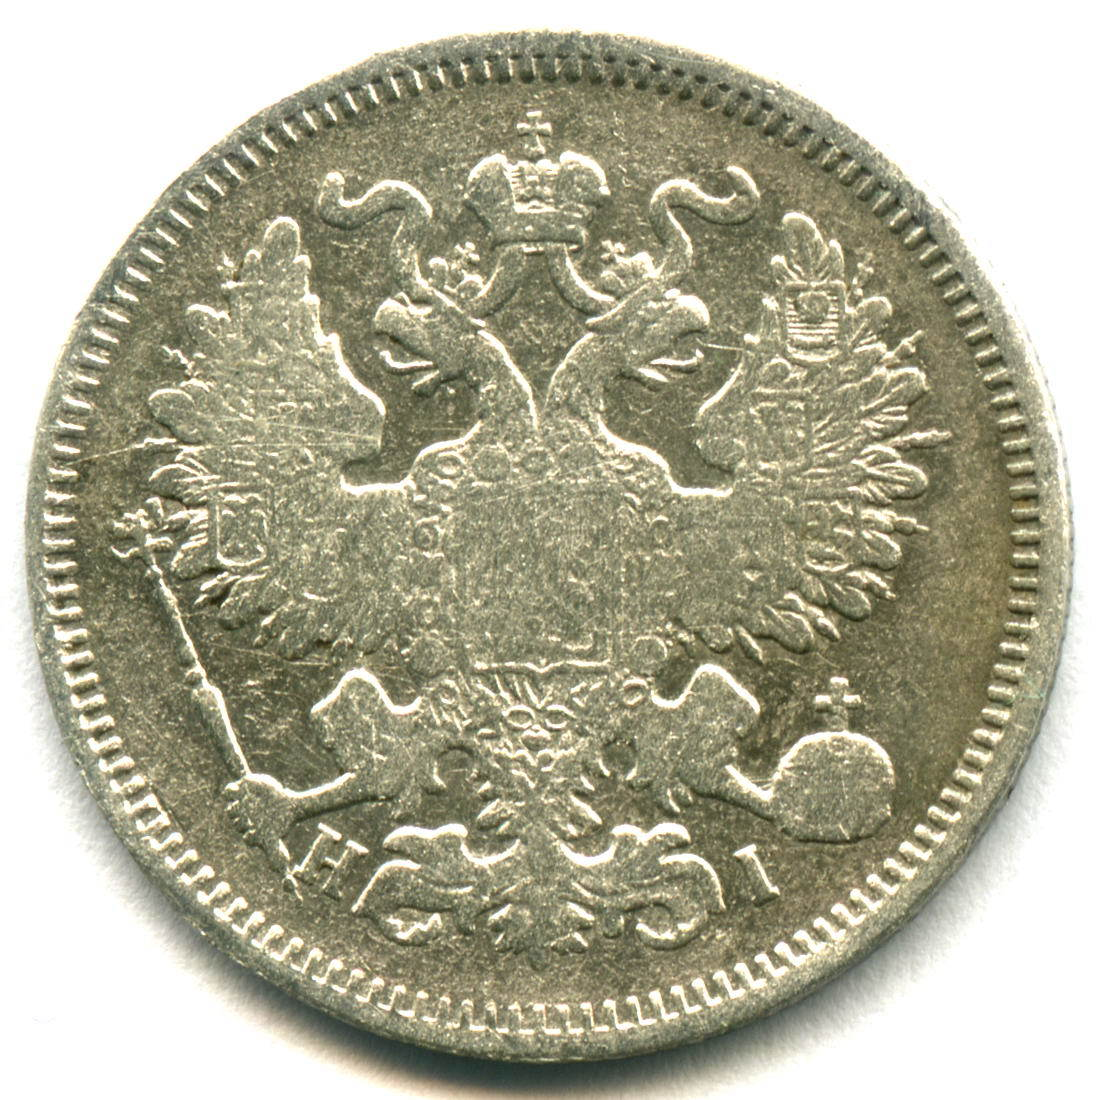 20 копеек 1869 год. СПБ НI. Александр II. F-VF